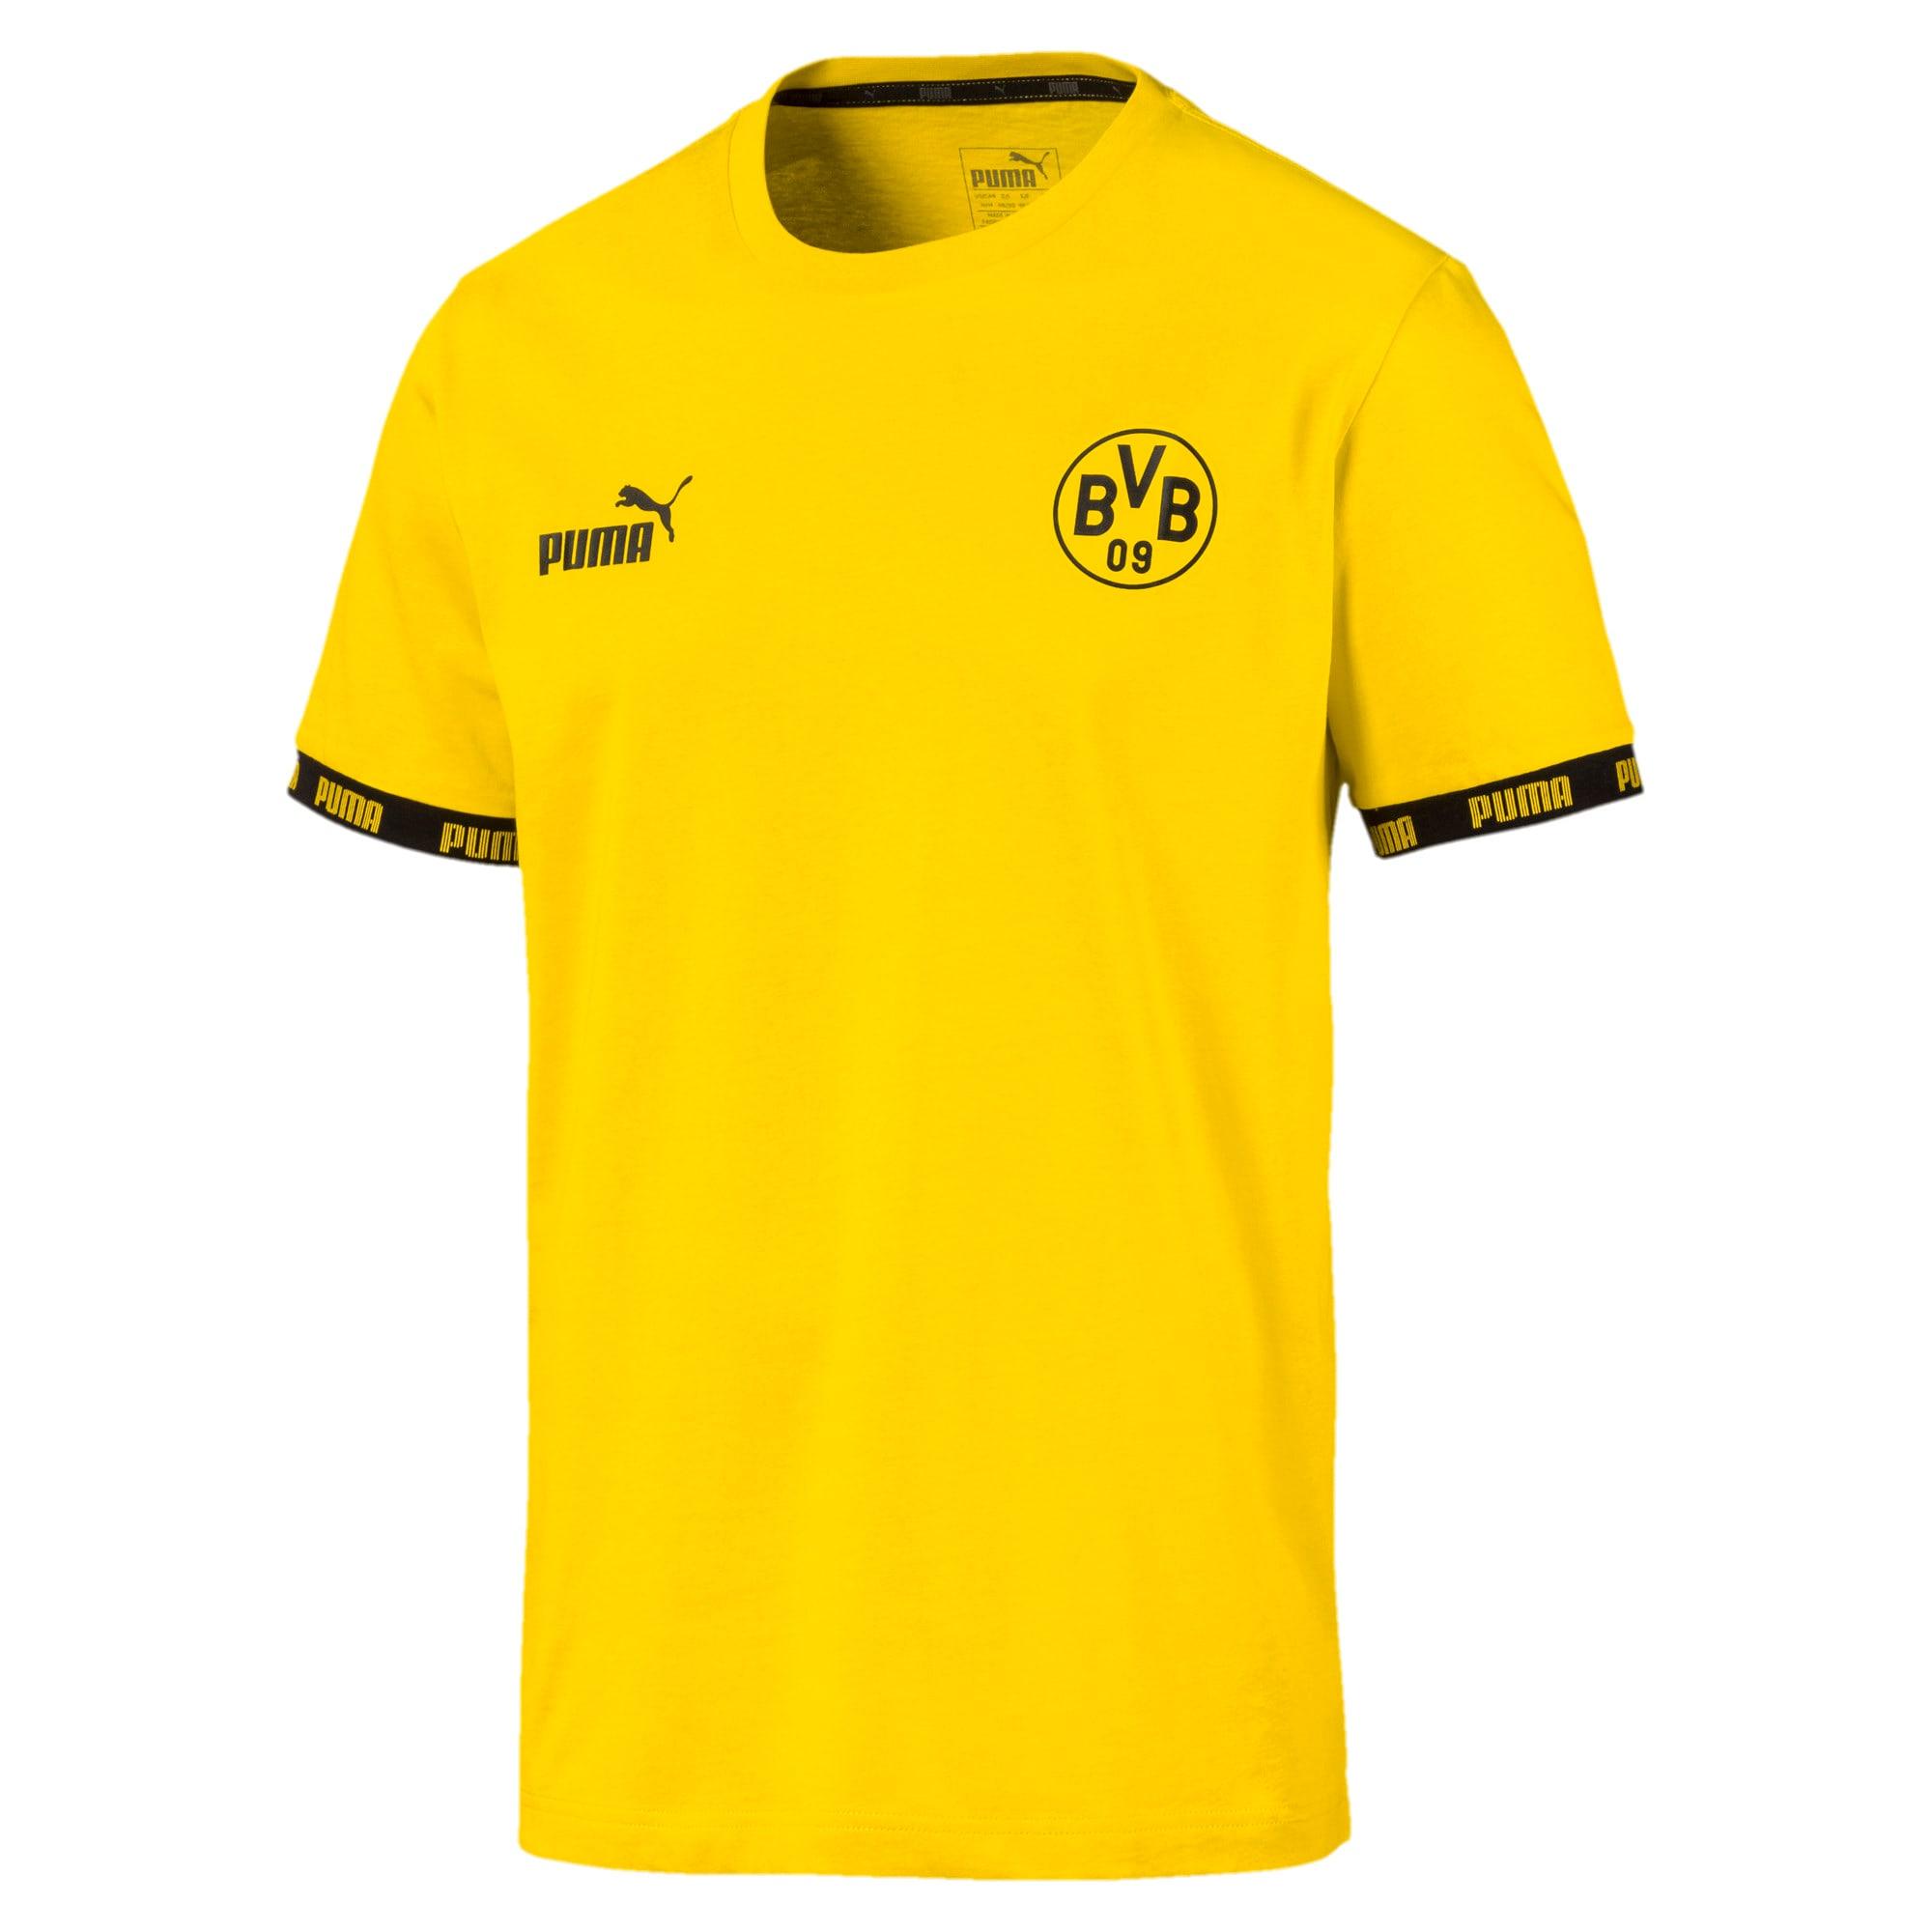 Thumbnail 4 of BVB Football Culture Men's Tee, Cyber Yellow, medium